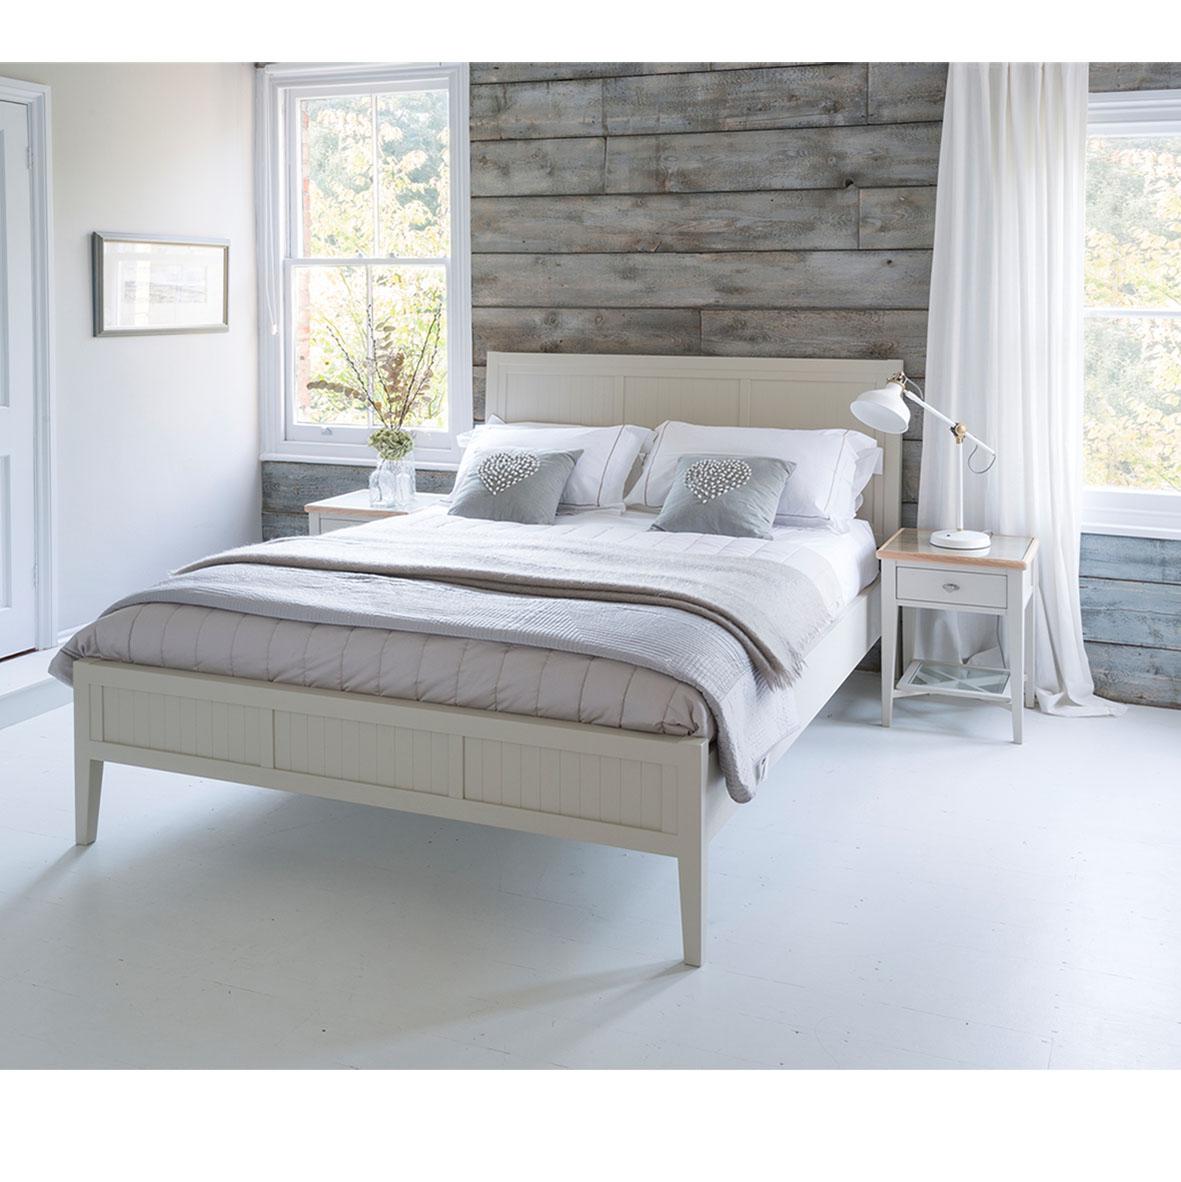 Coast Bed - 180cm